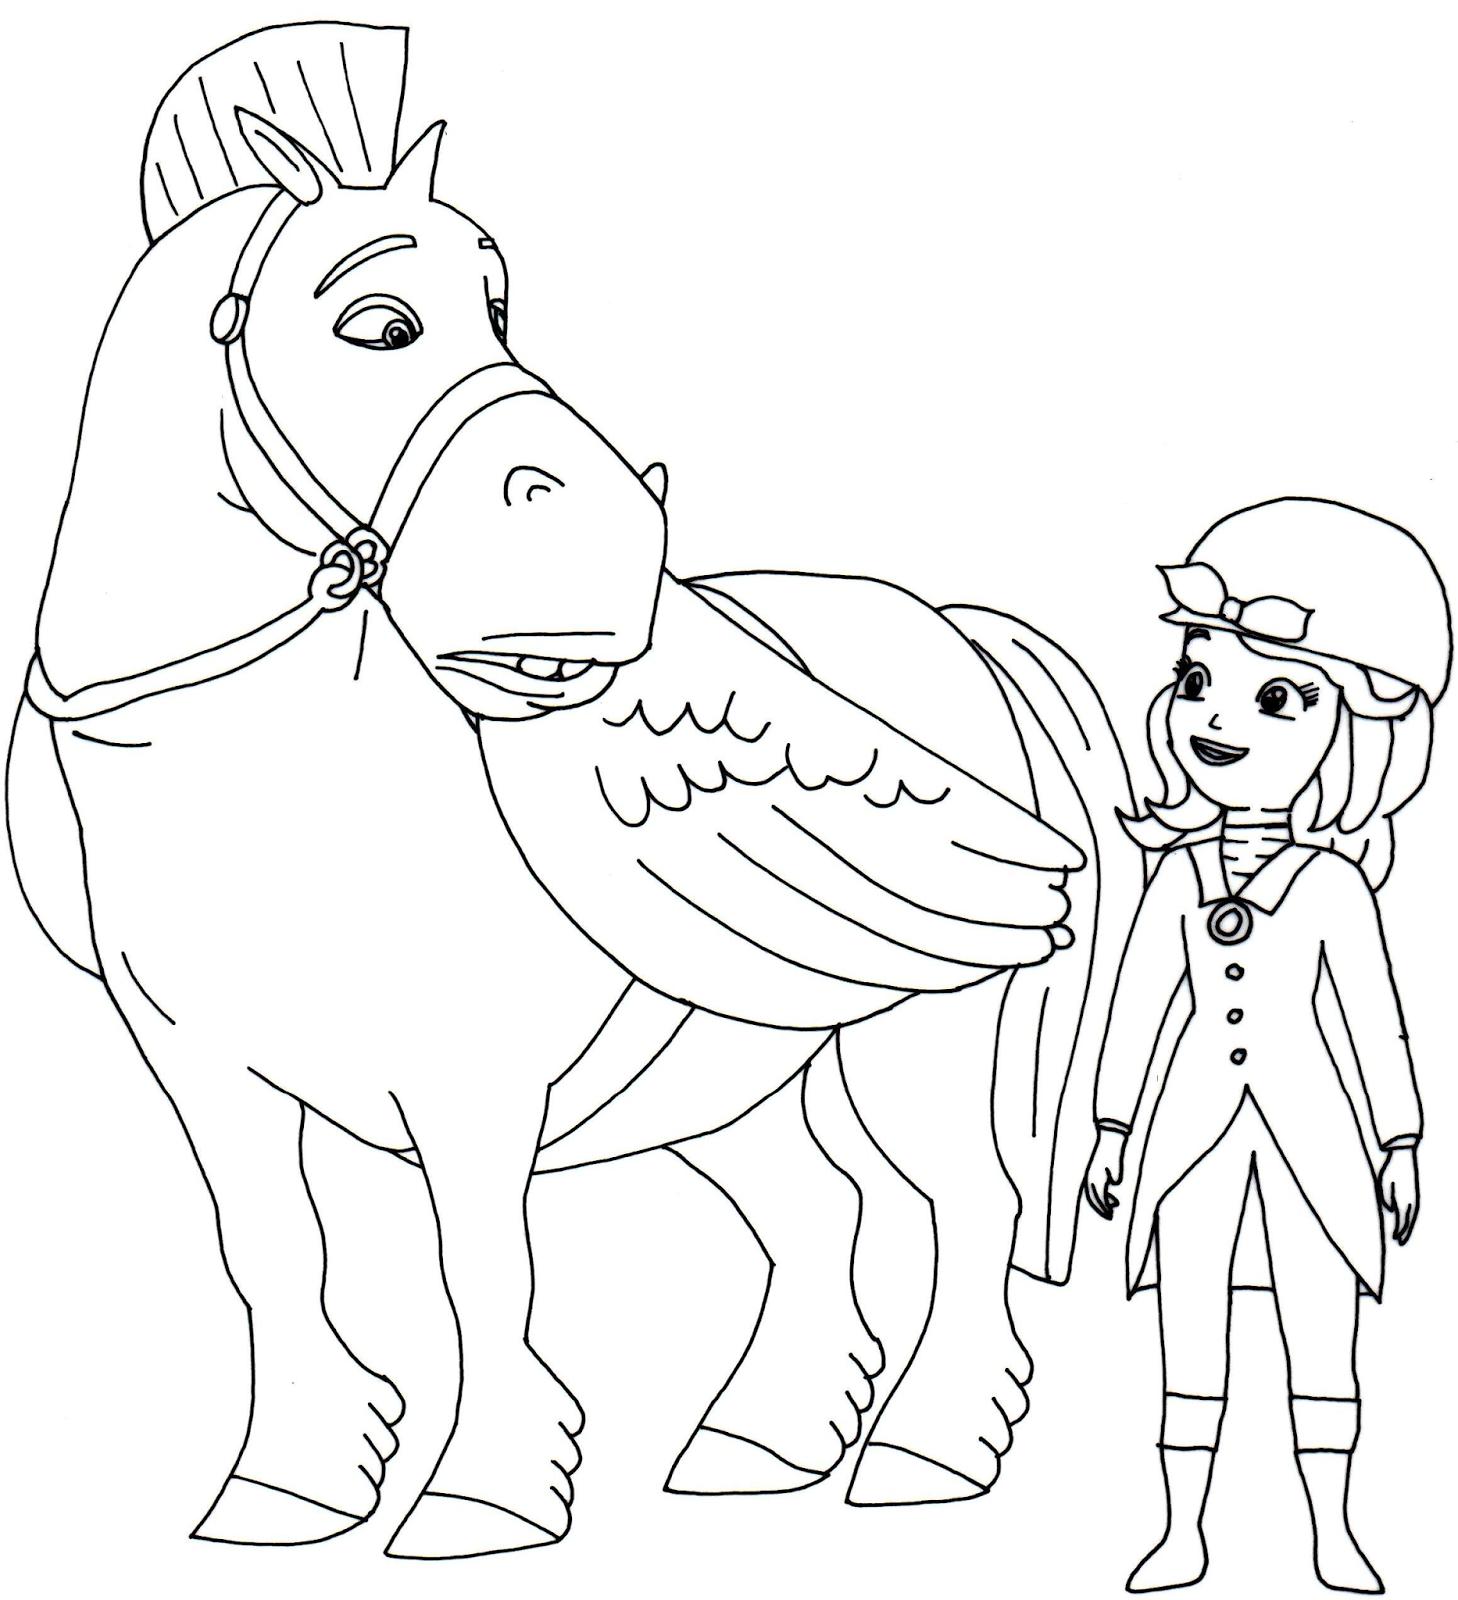 Princess ivy coloring page - Top 10 Disney Princess Sofia The First The Curse Of Princess Ivy